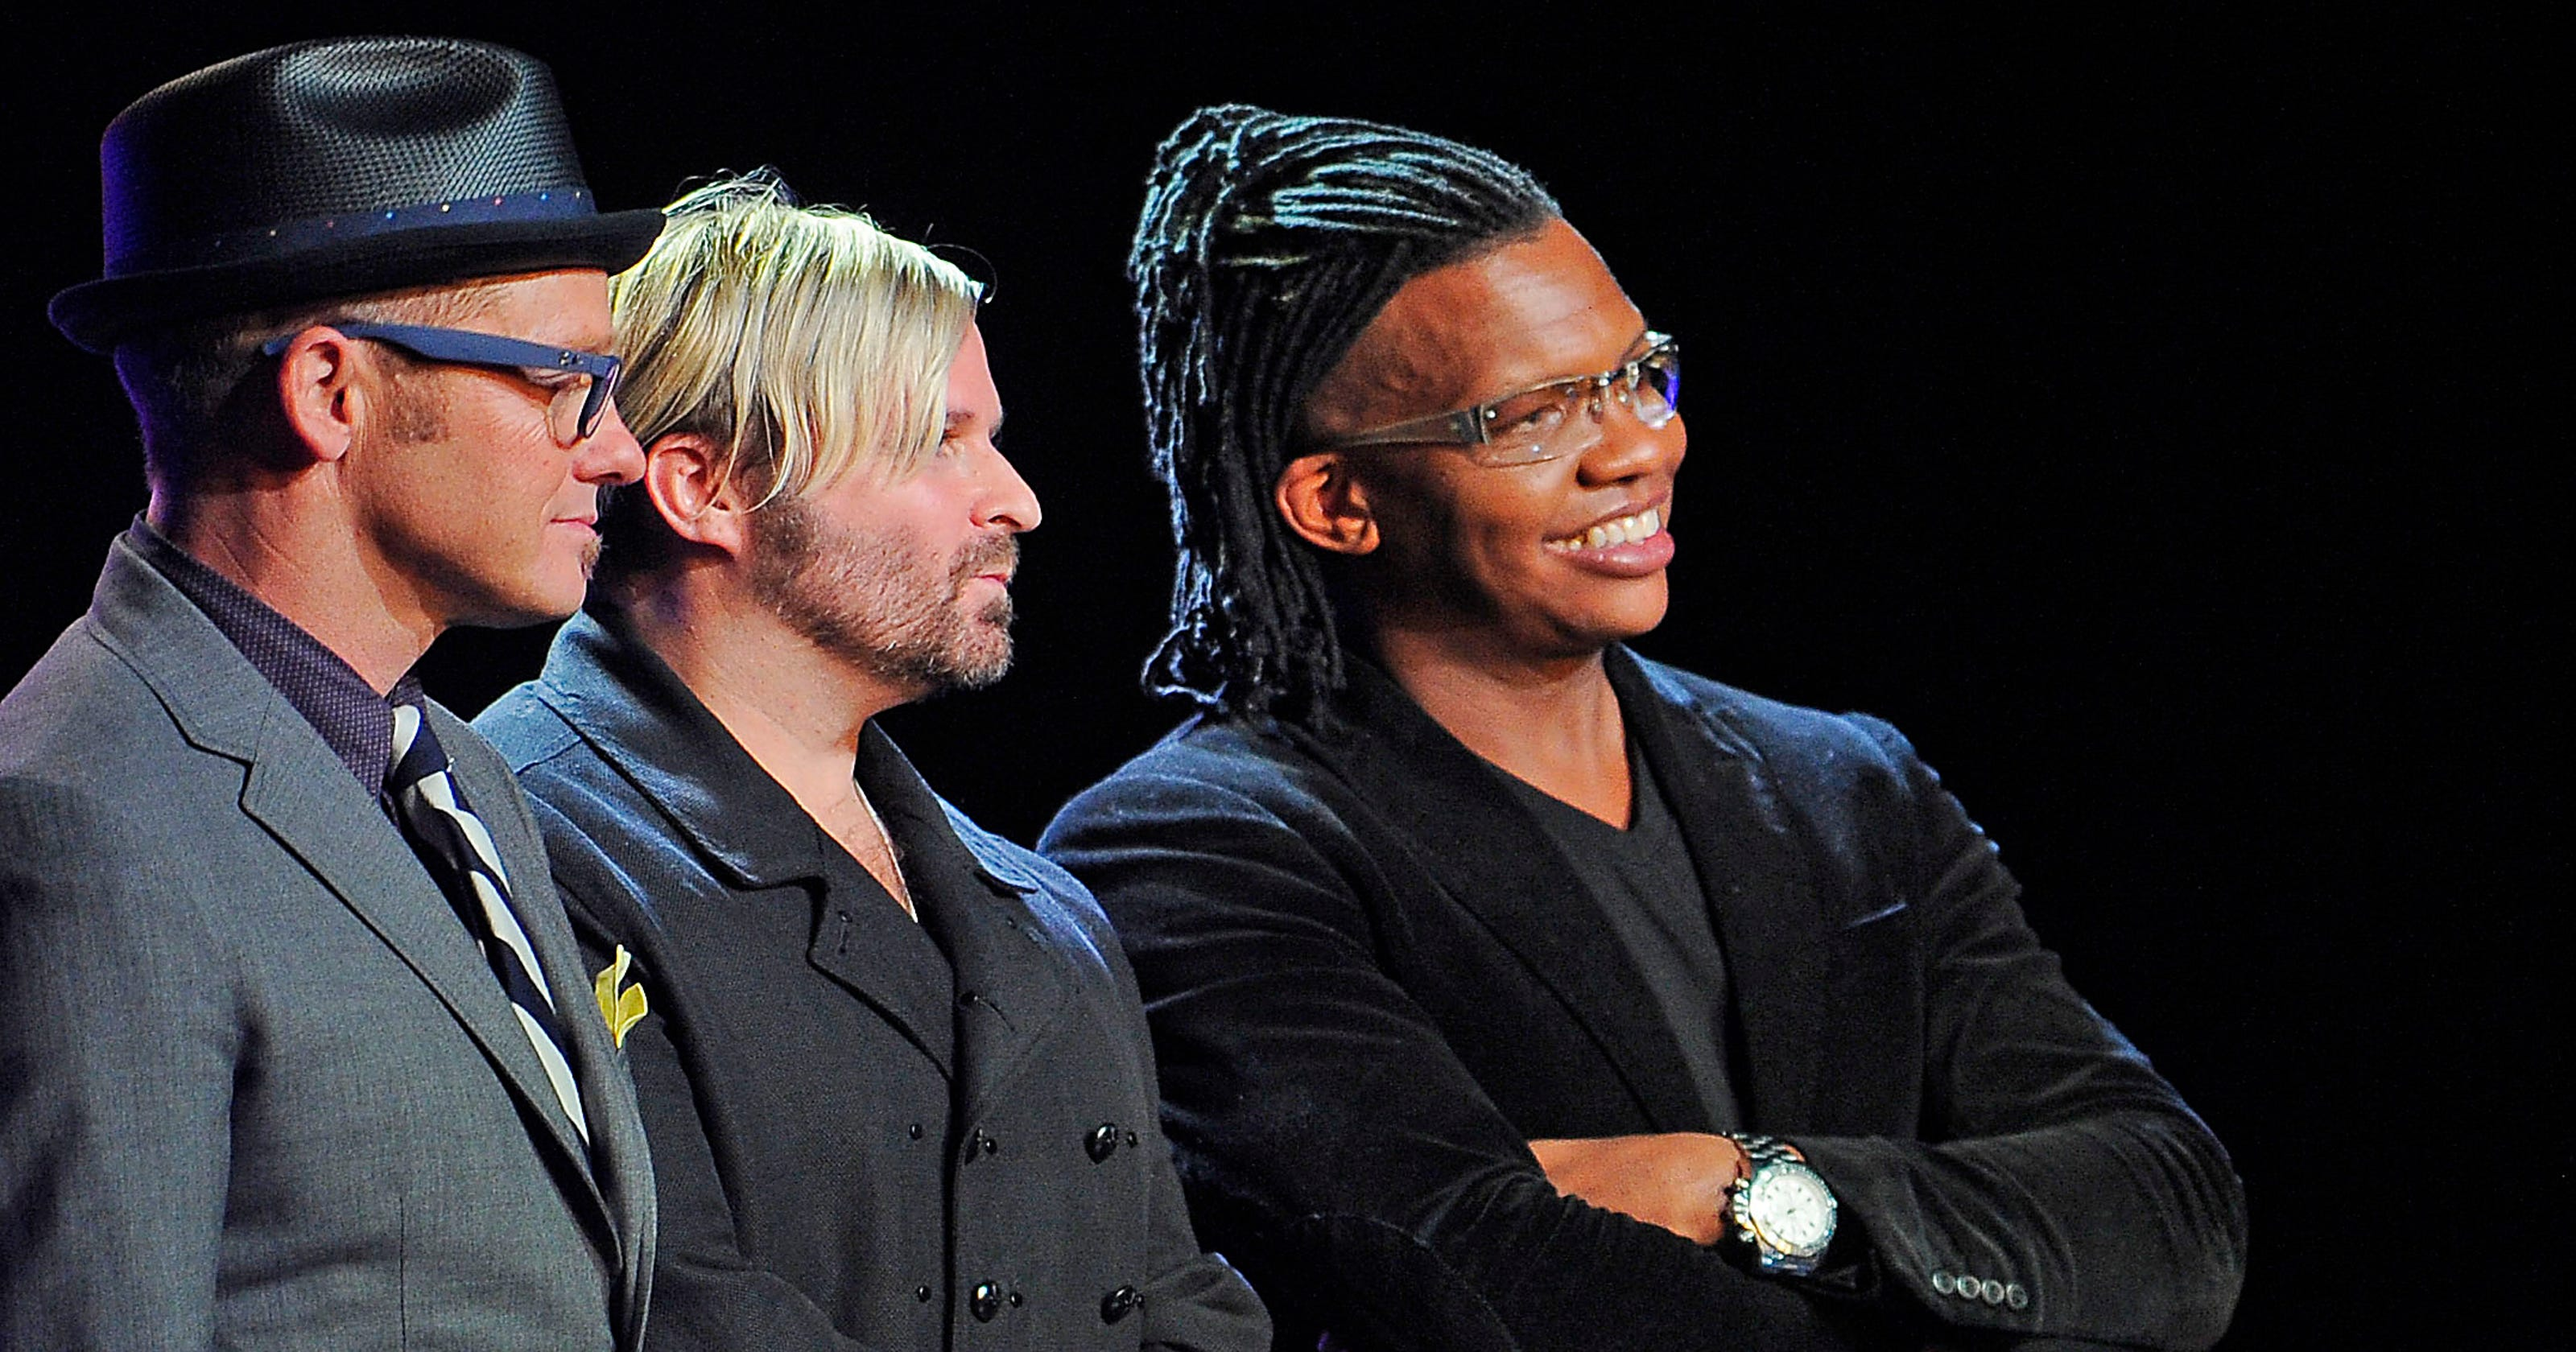 dc Talk reunion sparks a backlash